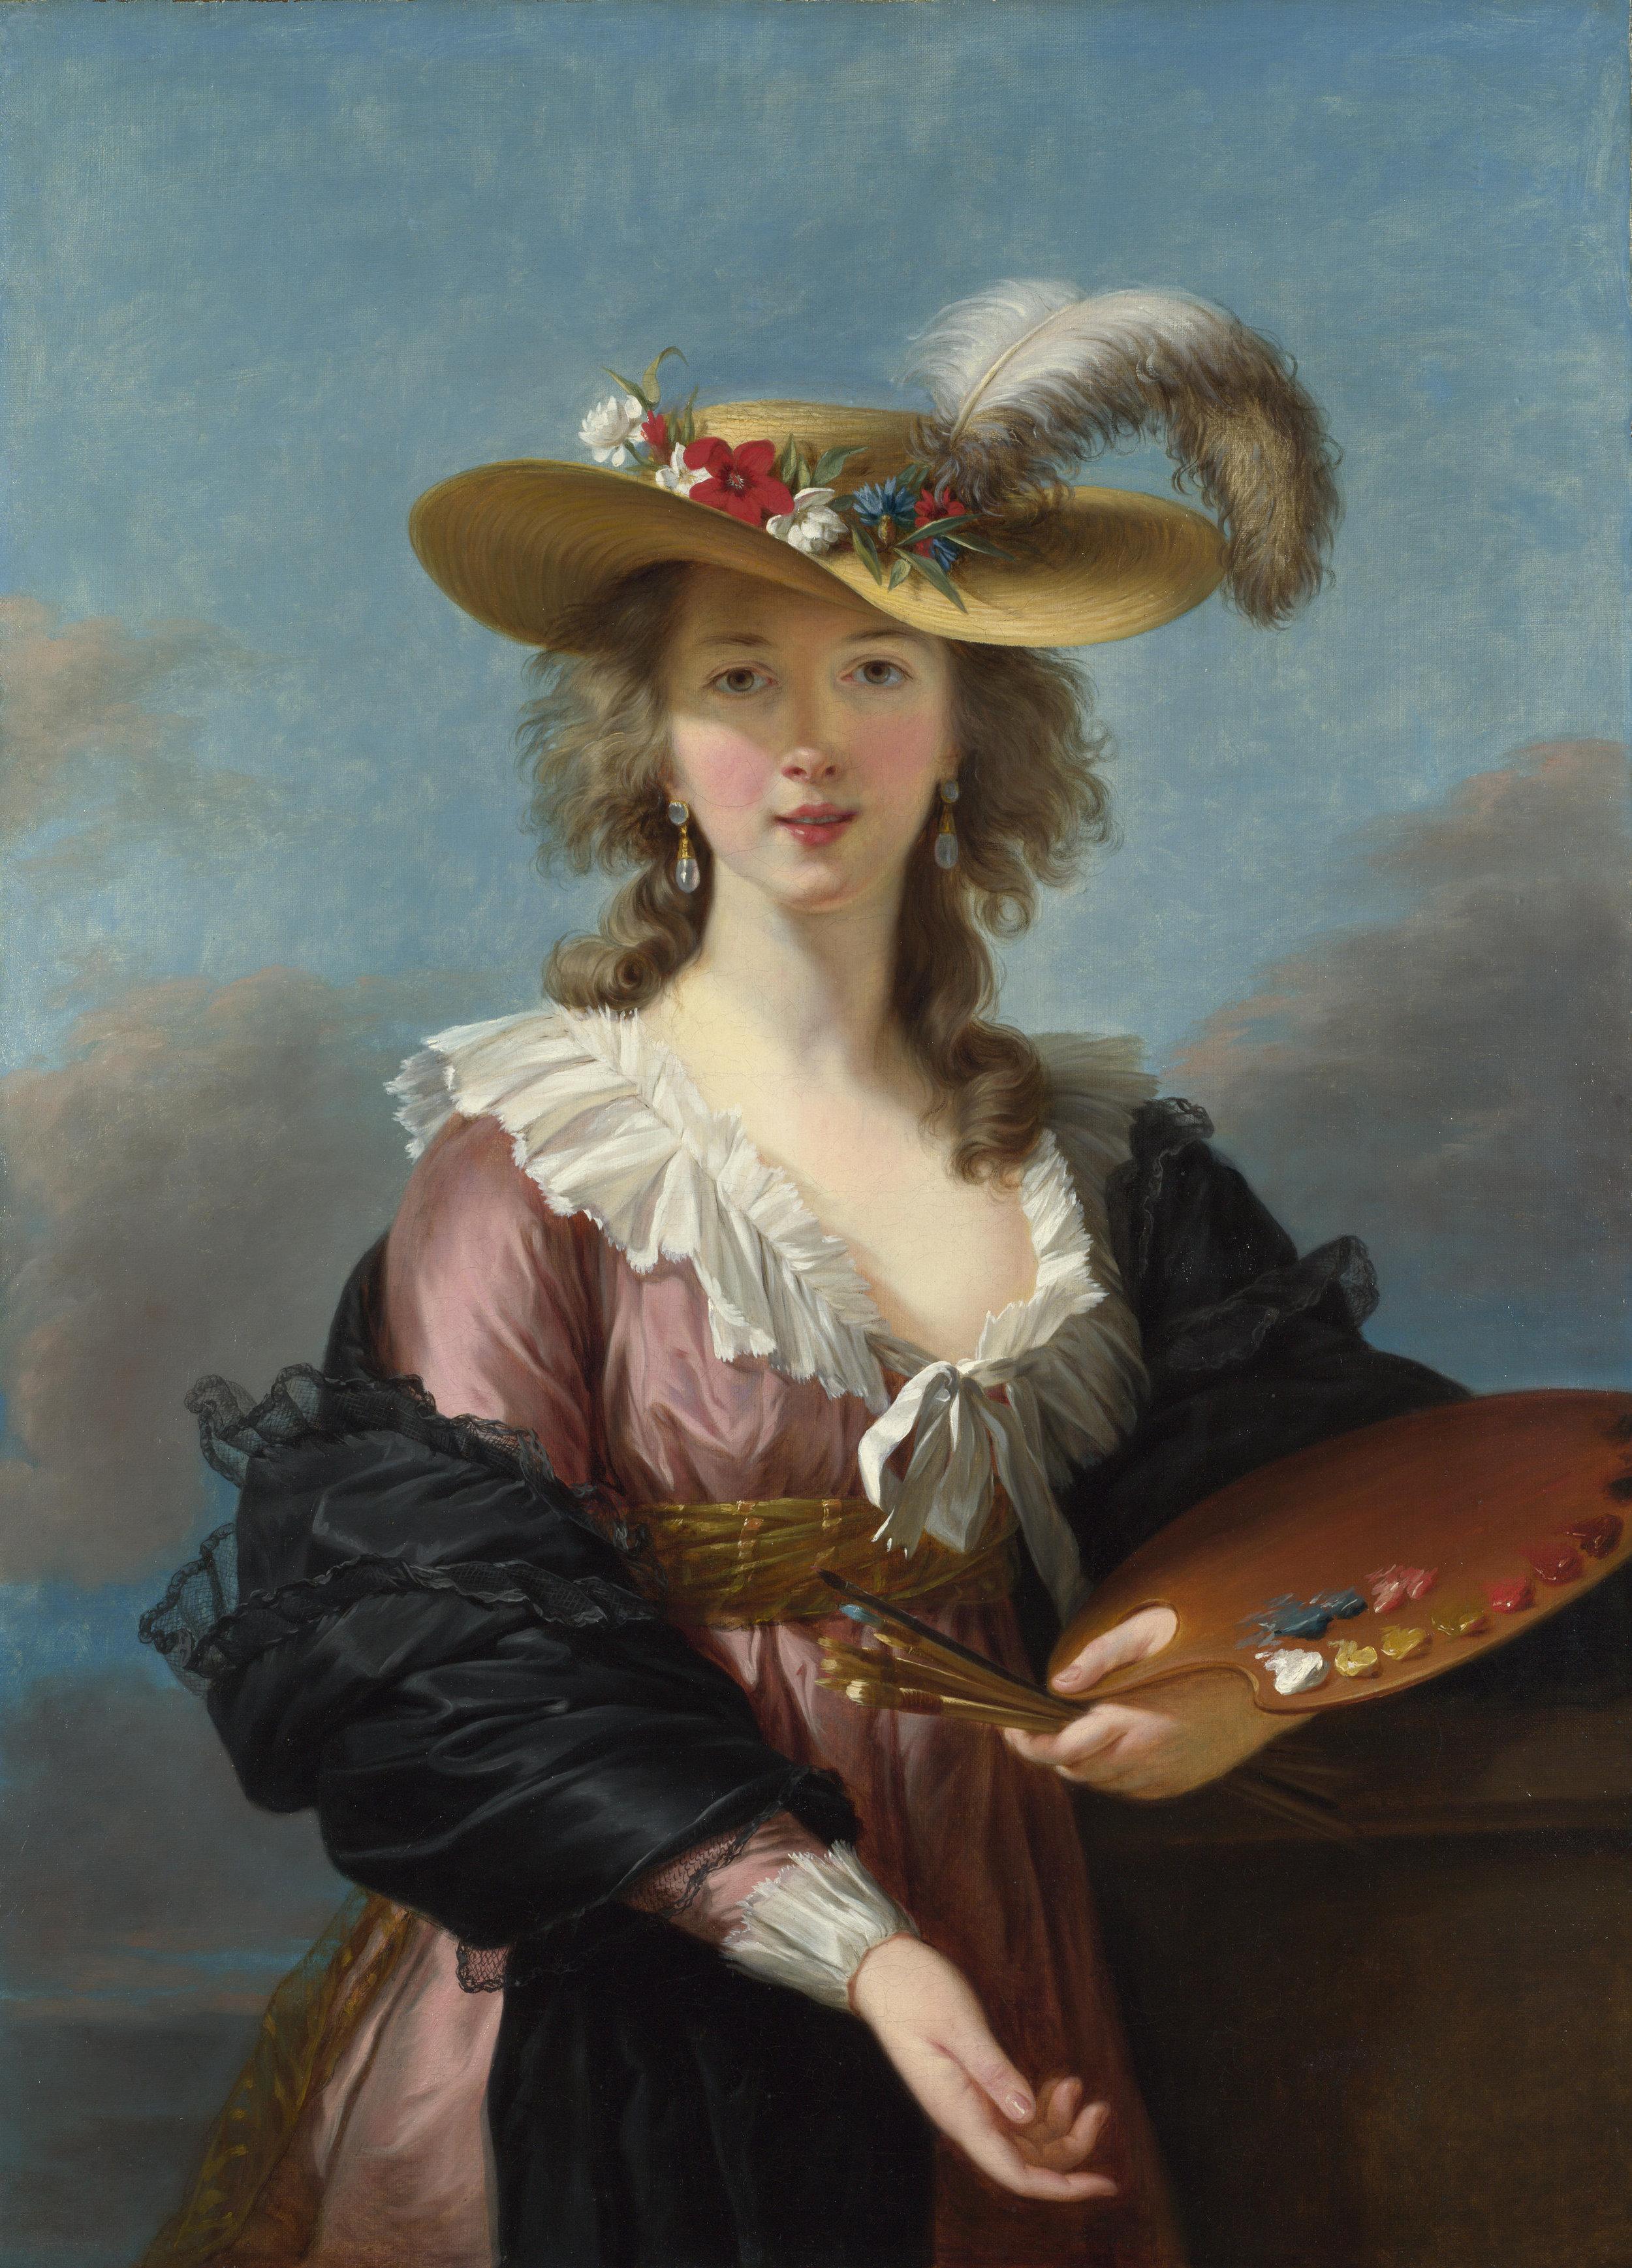 Elisabeth Vigée Lebrun, Self-Portrait, after 1782, oil on canvas, National Gallery, London